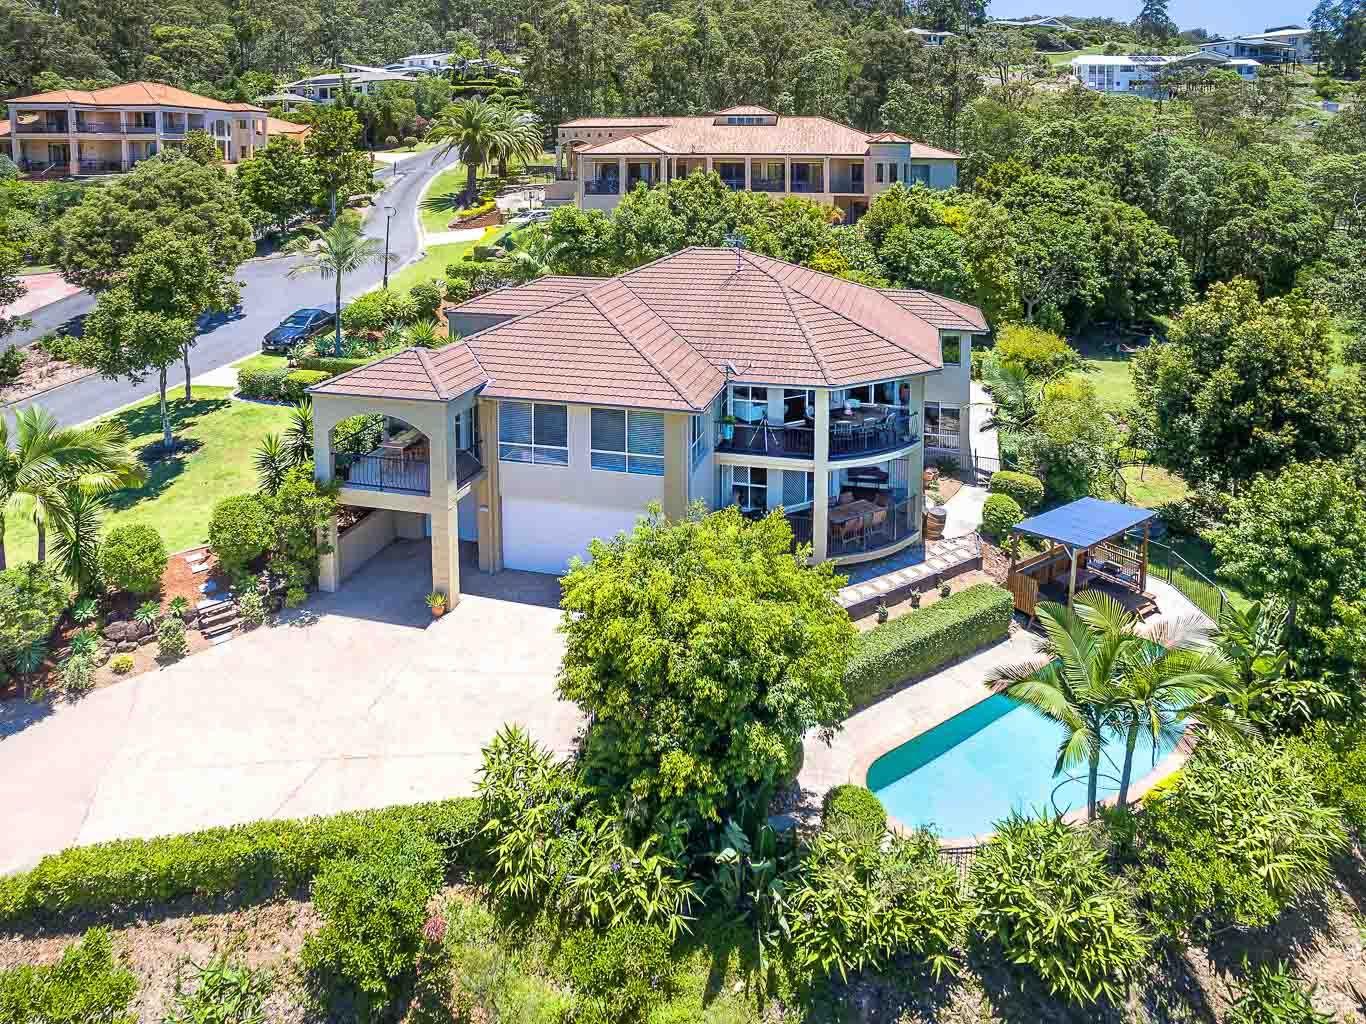 13-15 Coralcoast Drive, Tallai QLD 4213, Image 0